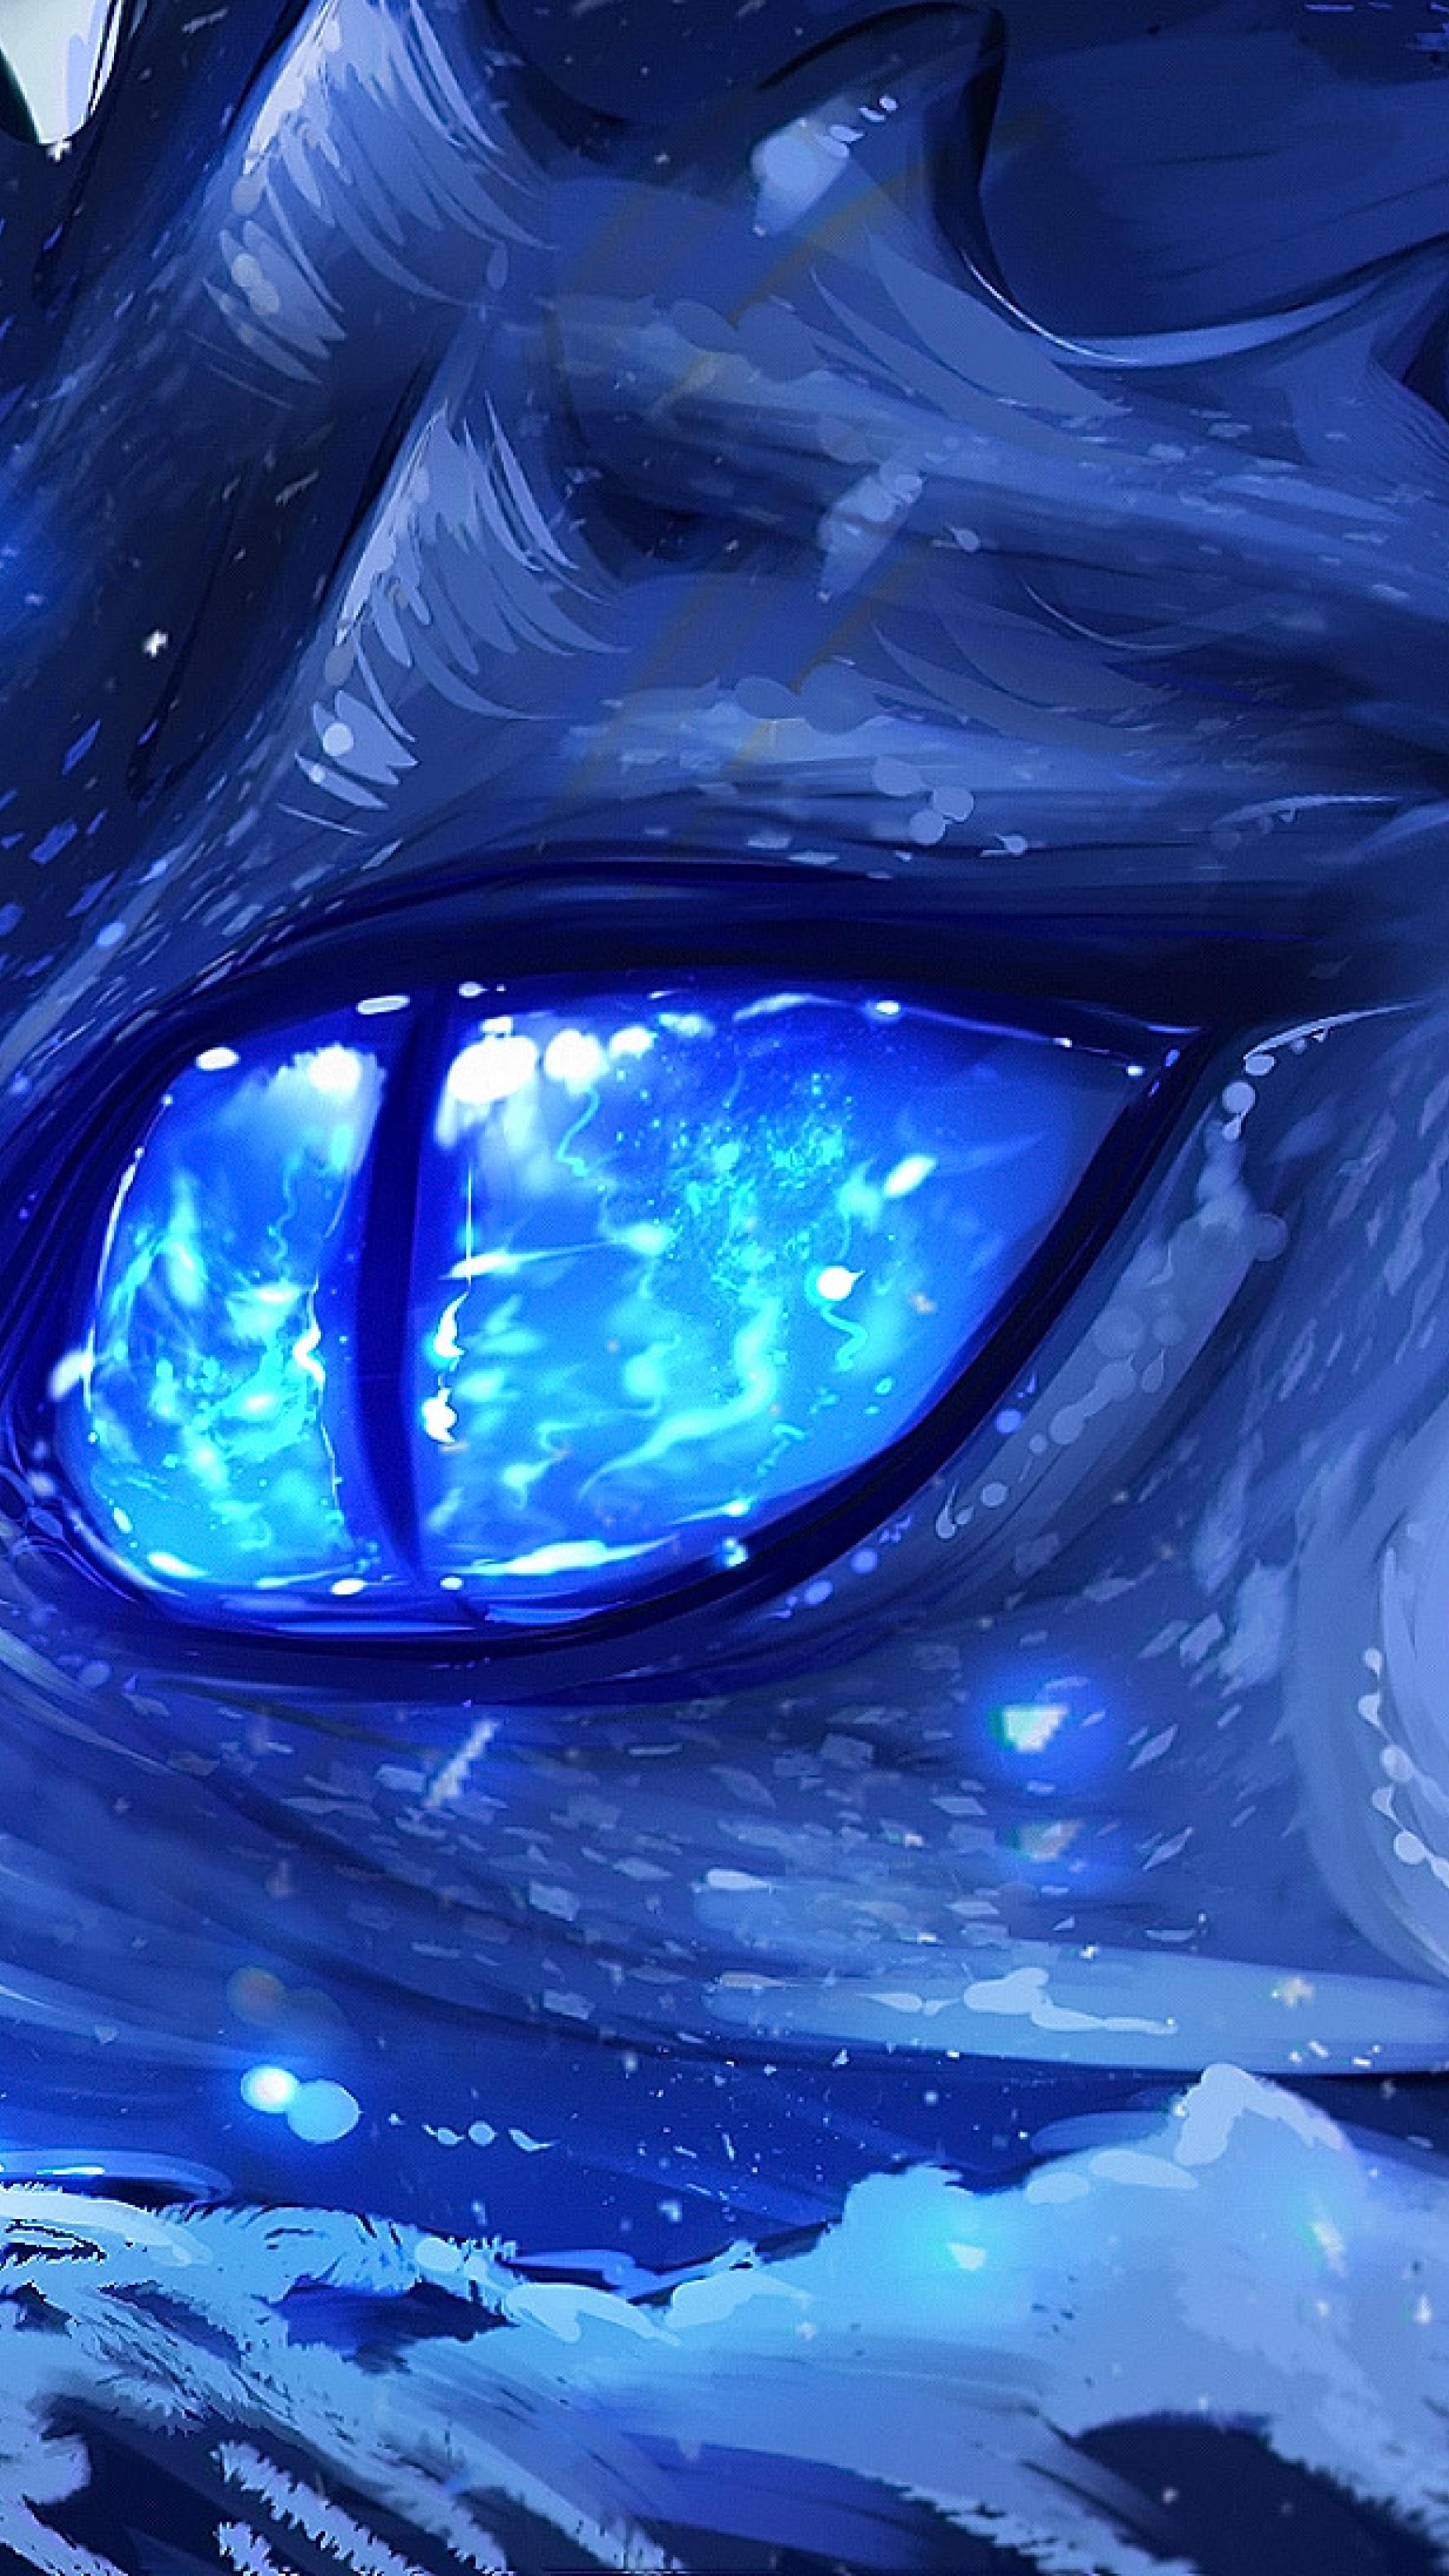 Anime Dragon Eye, Full HD Wallpaper